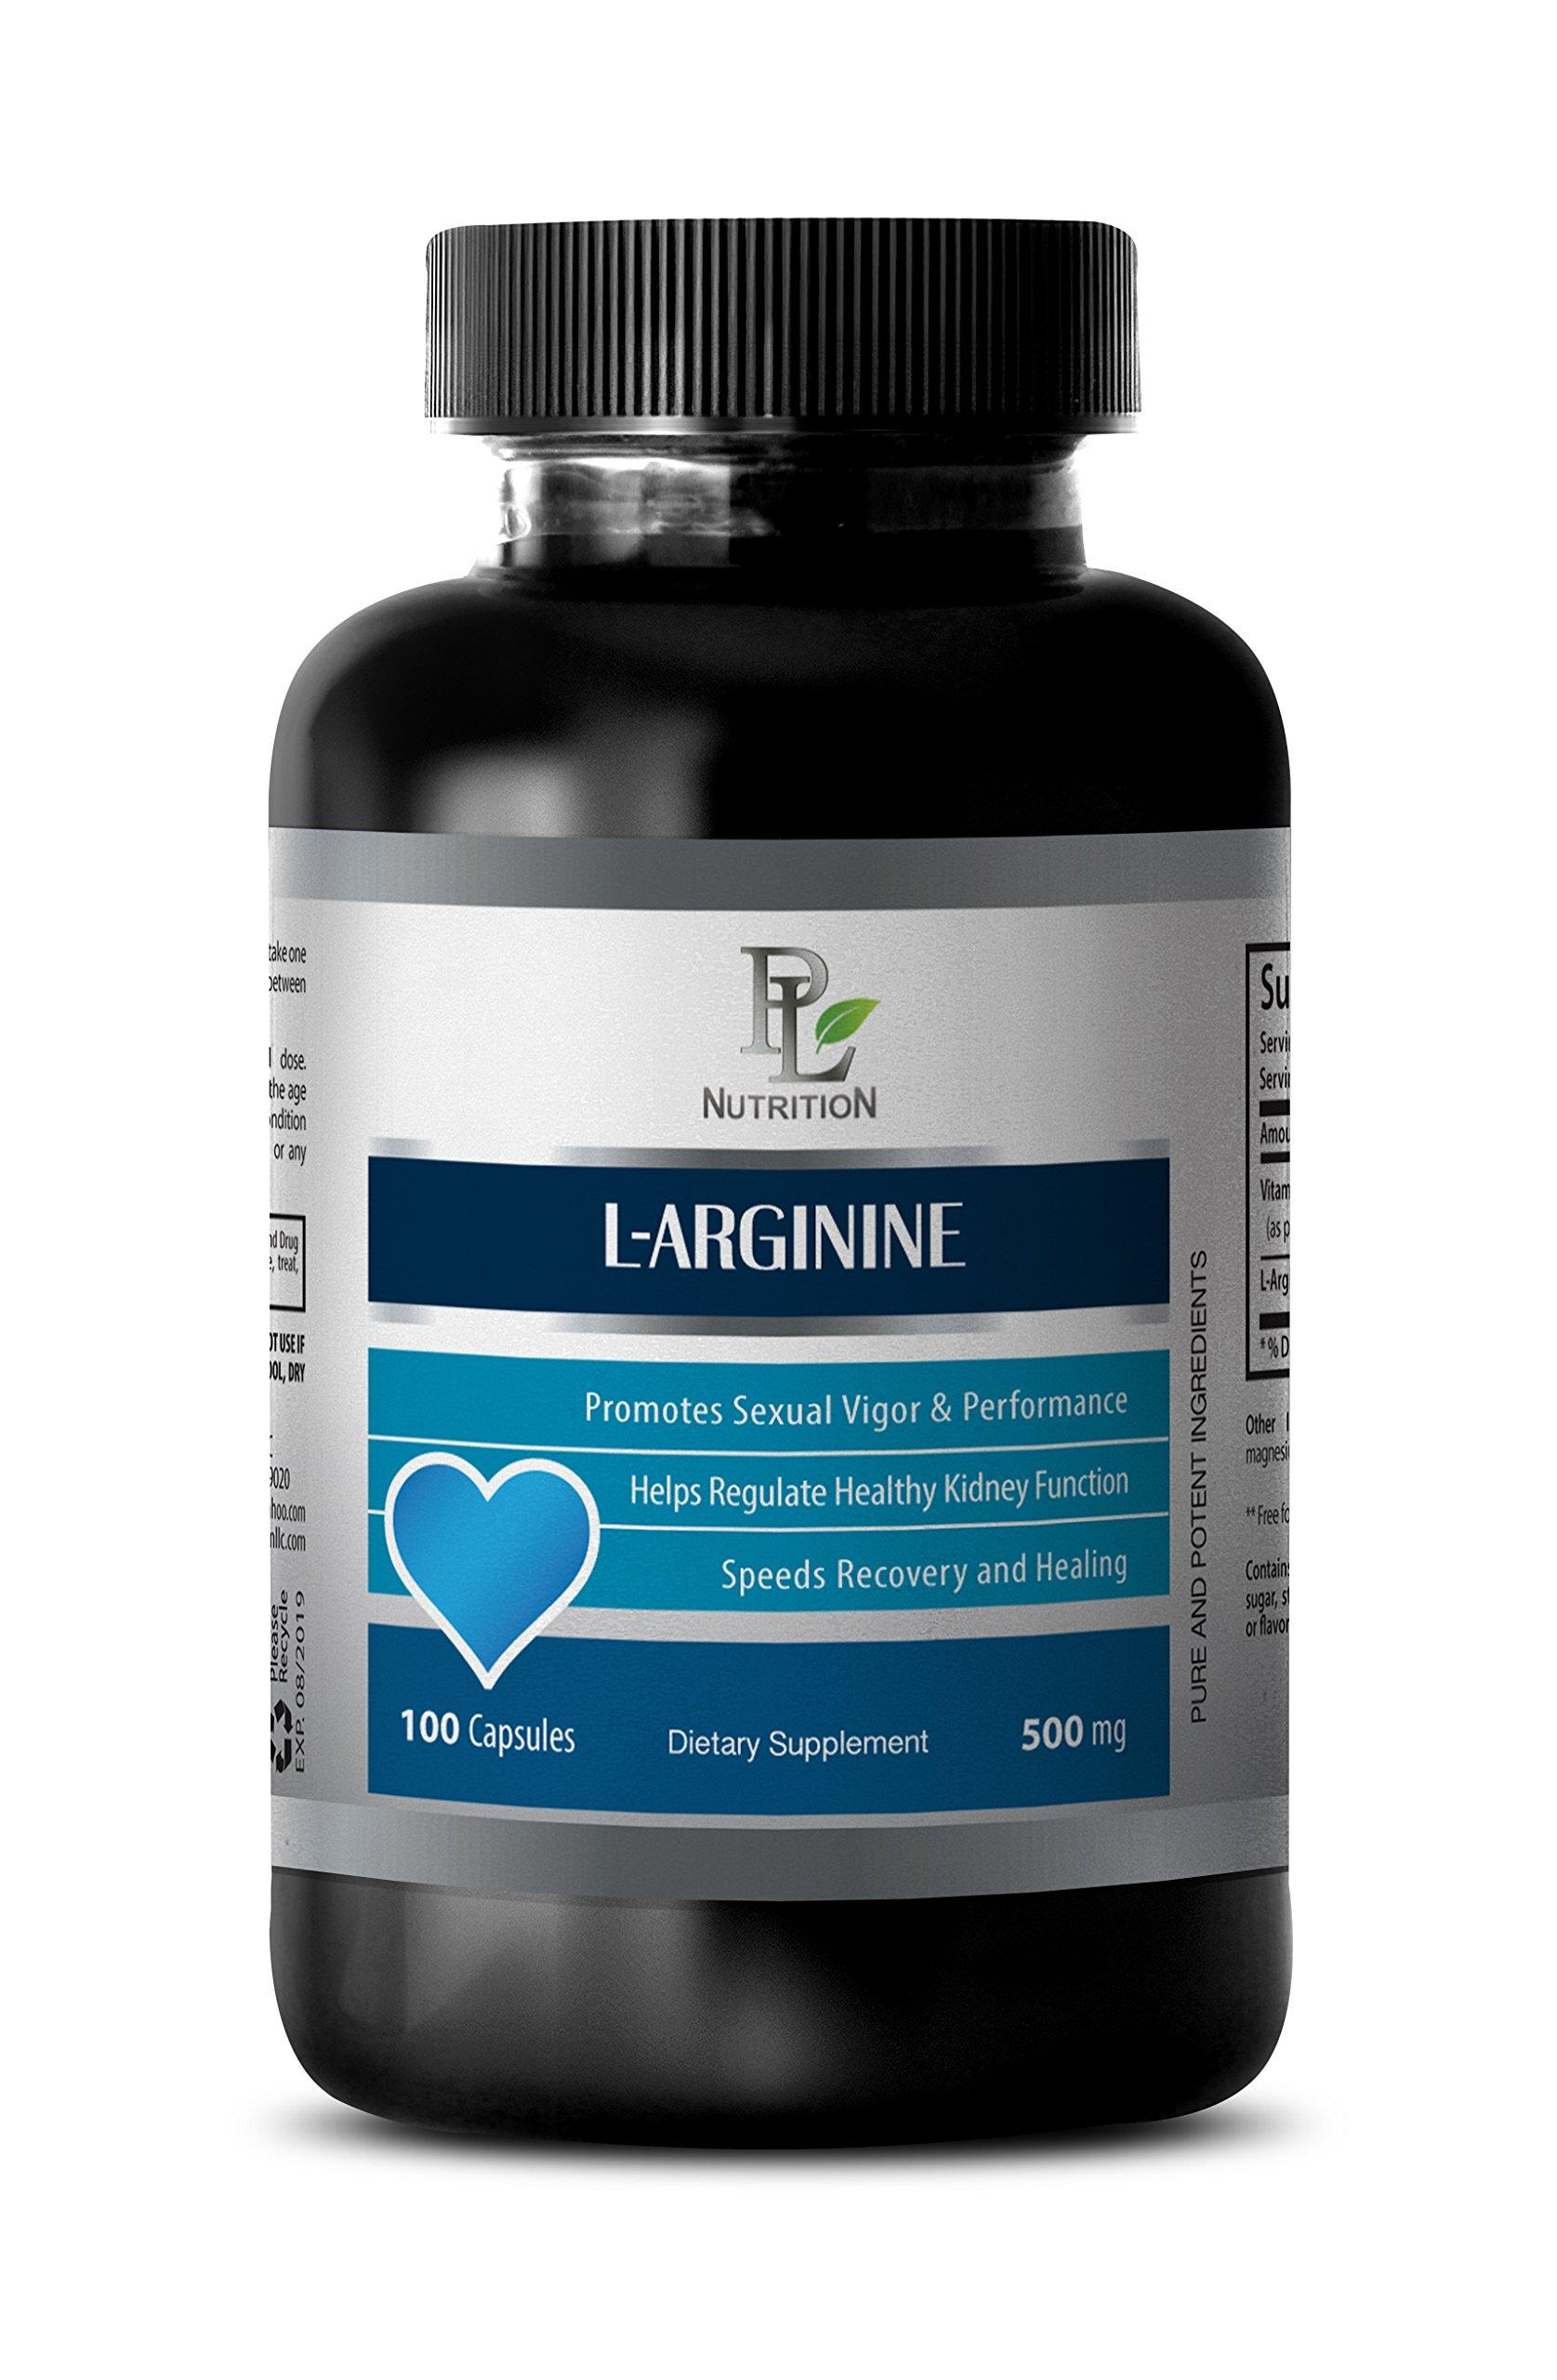 Natural sexual enhancement pills - L-ARGININE (500Mg) - L-arginine supplement - 1 Bottle 100 Capsules